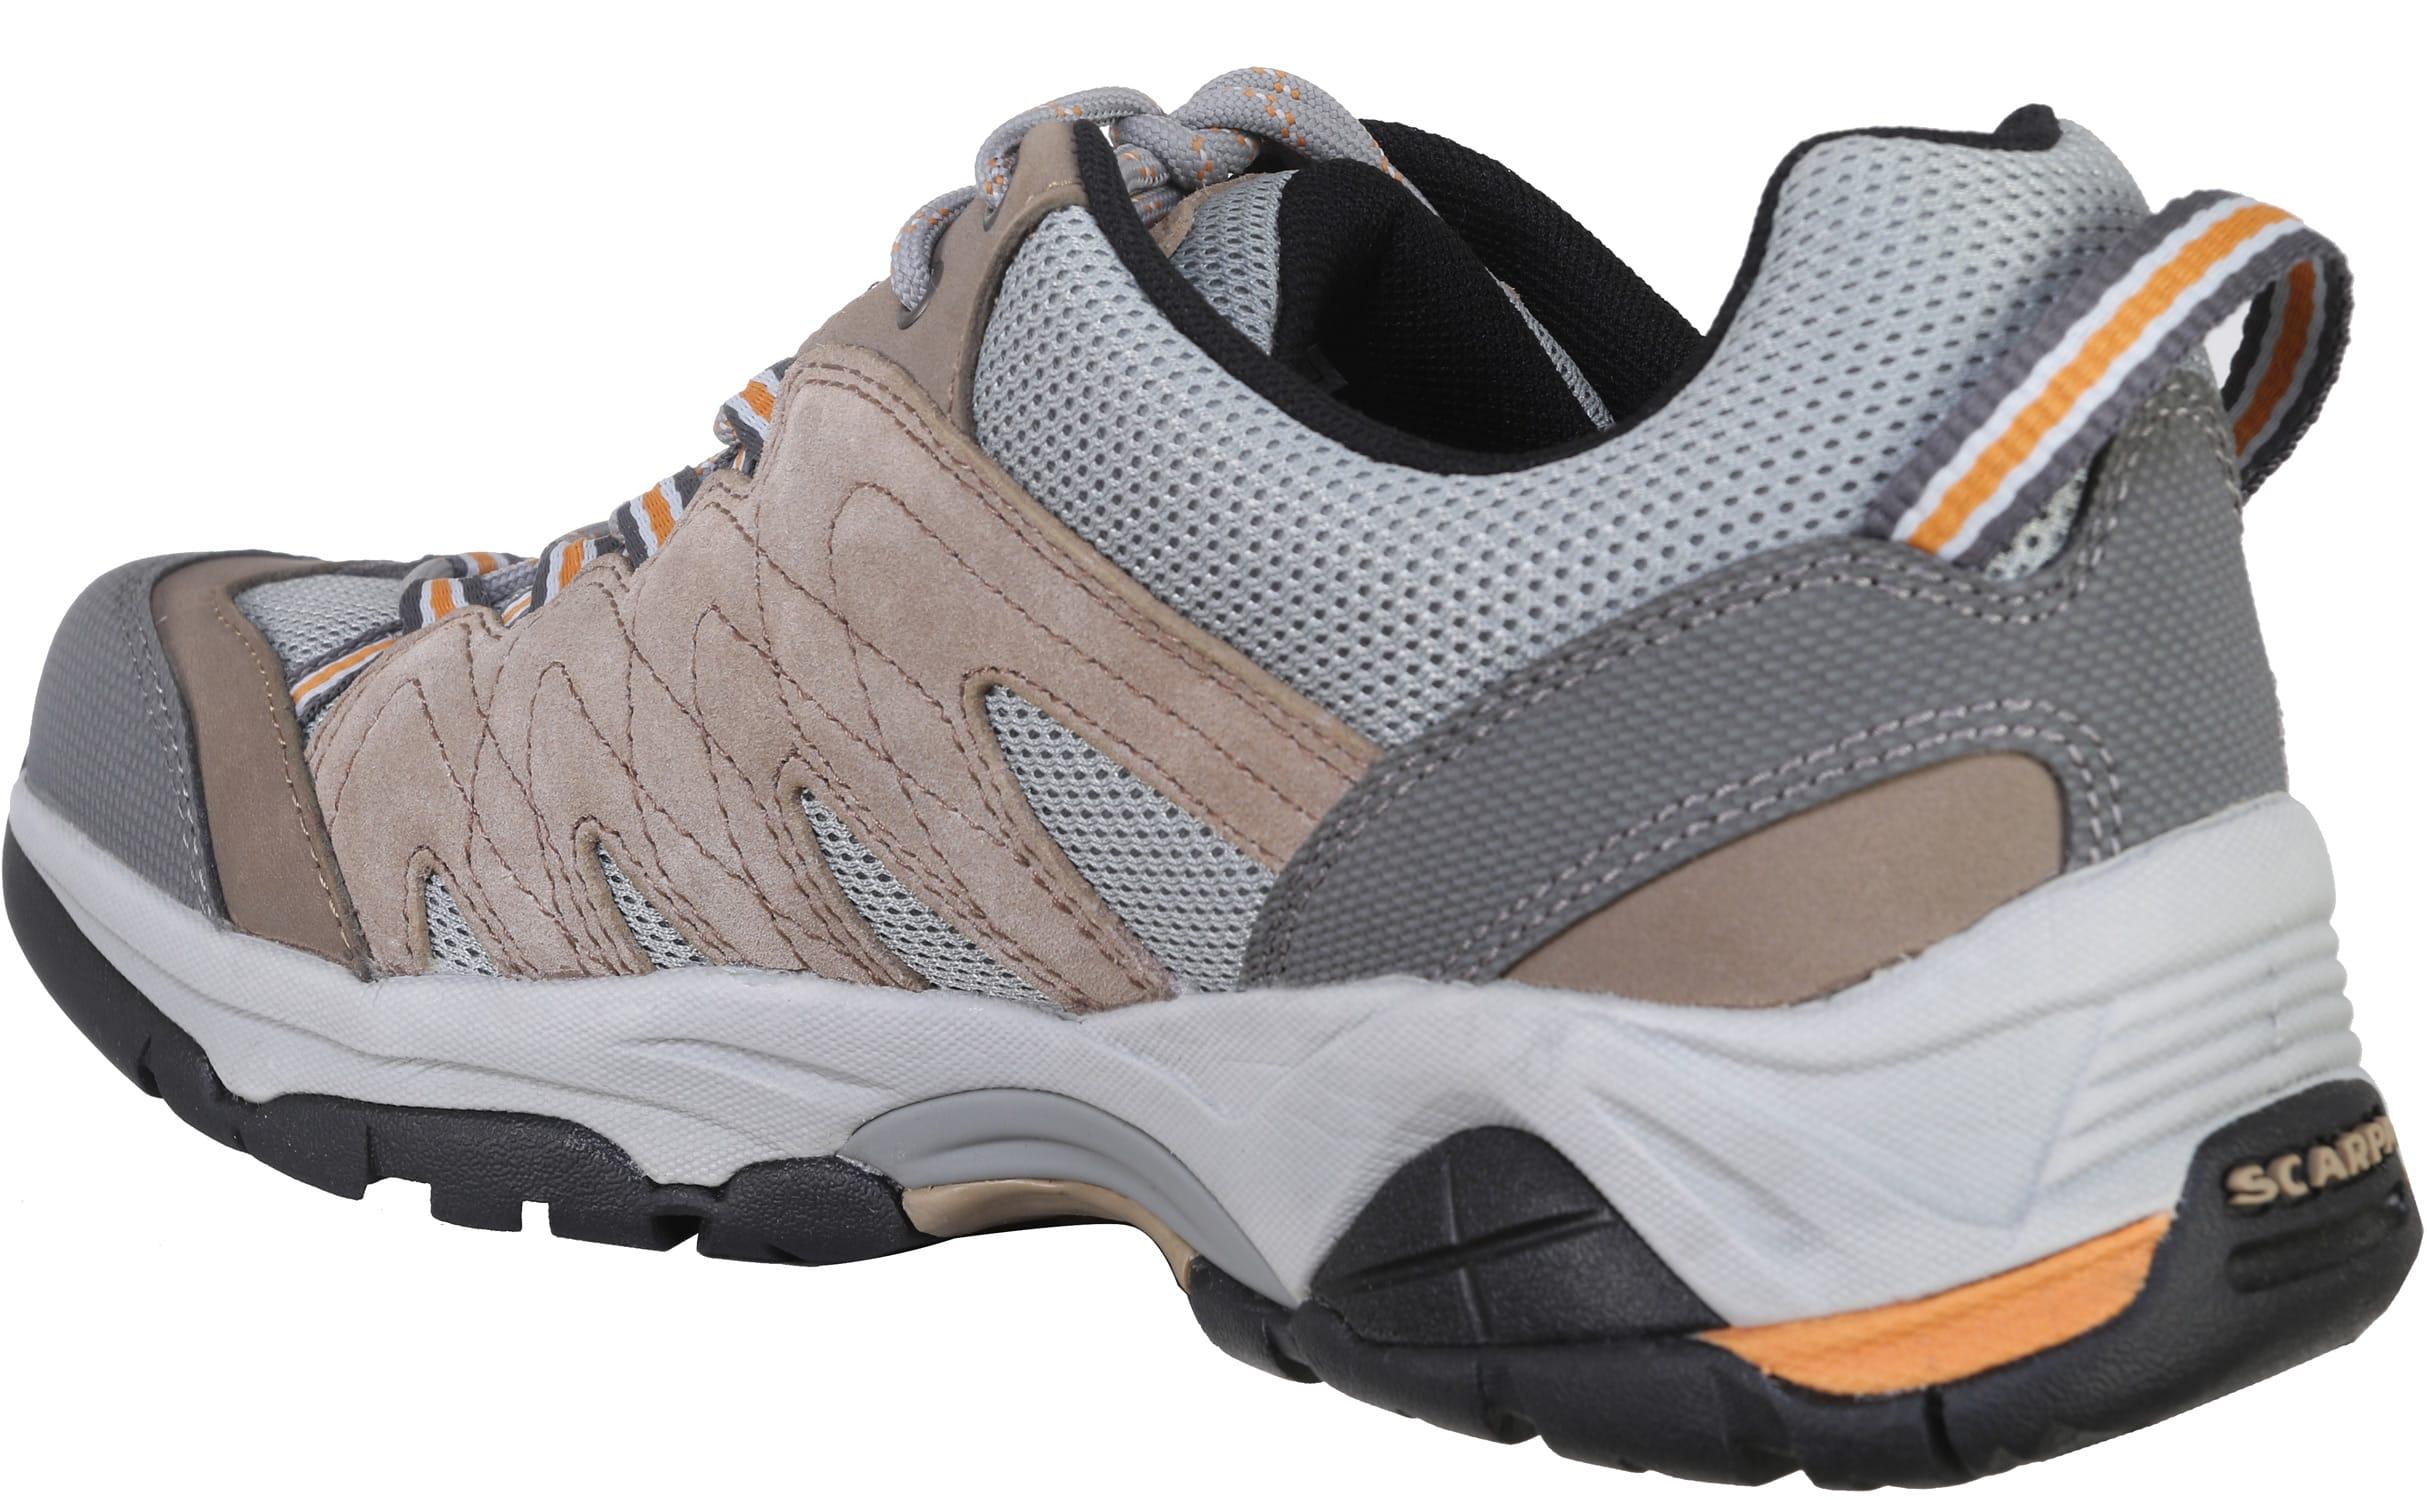 4bb9f29922d8 Scarpa Moraine GTX Hiking Shoes - thumbnail 3